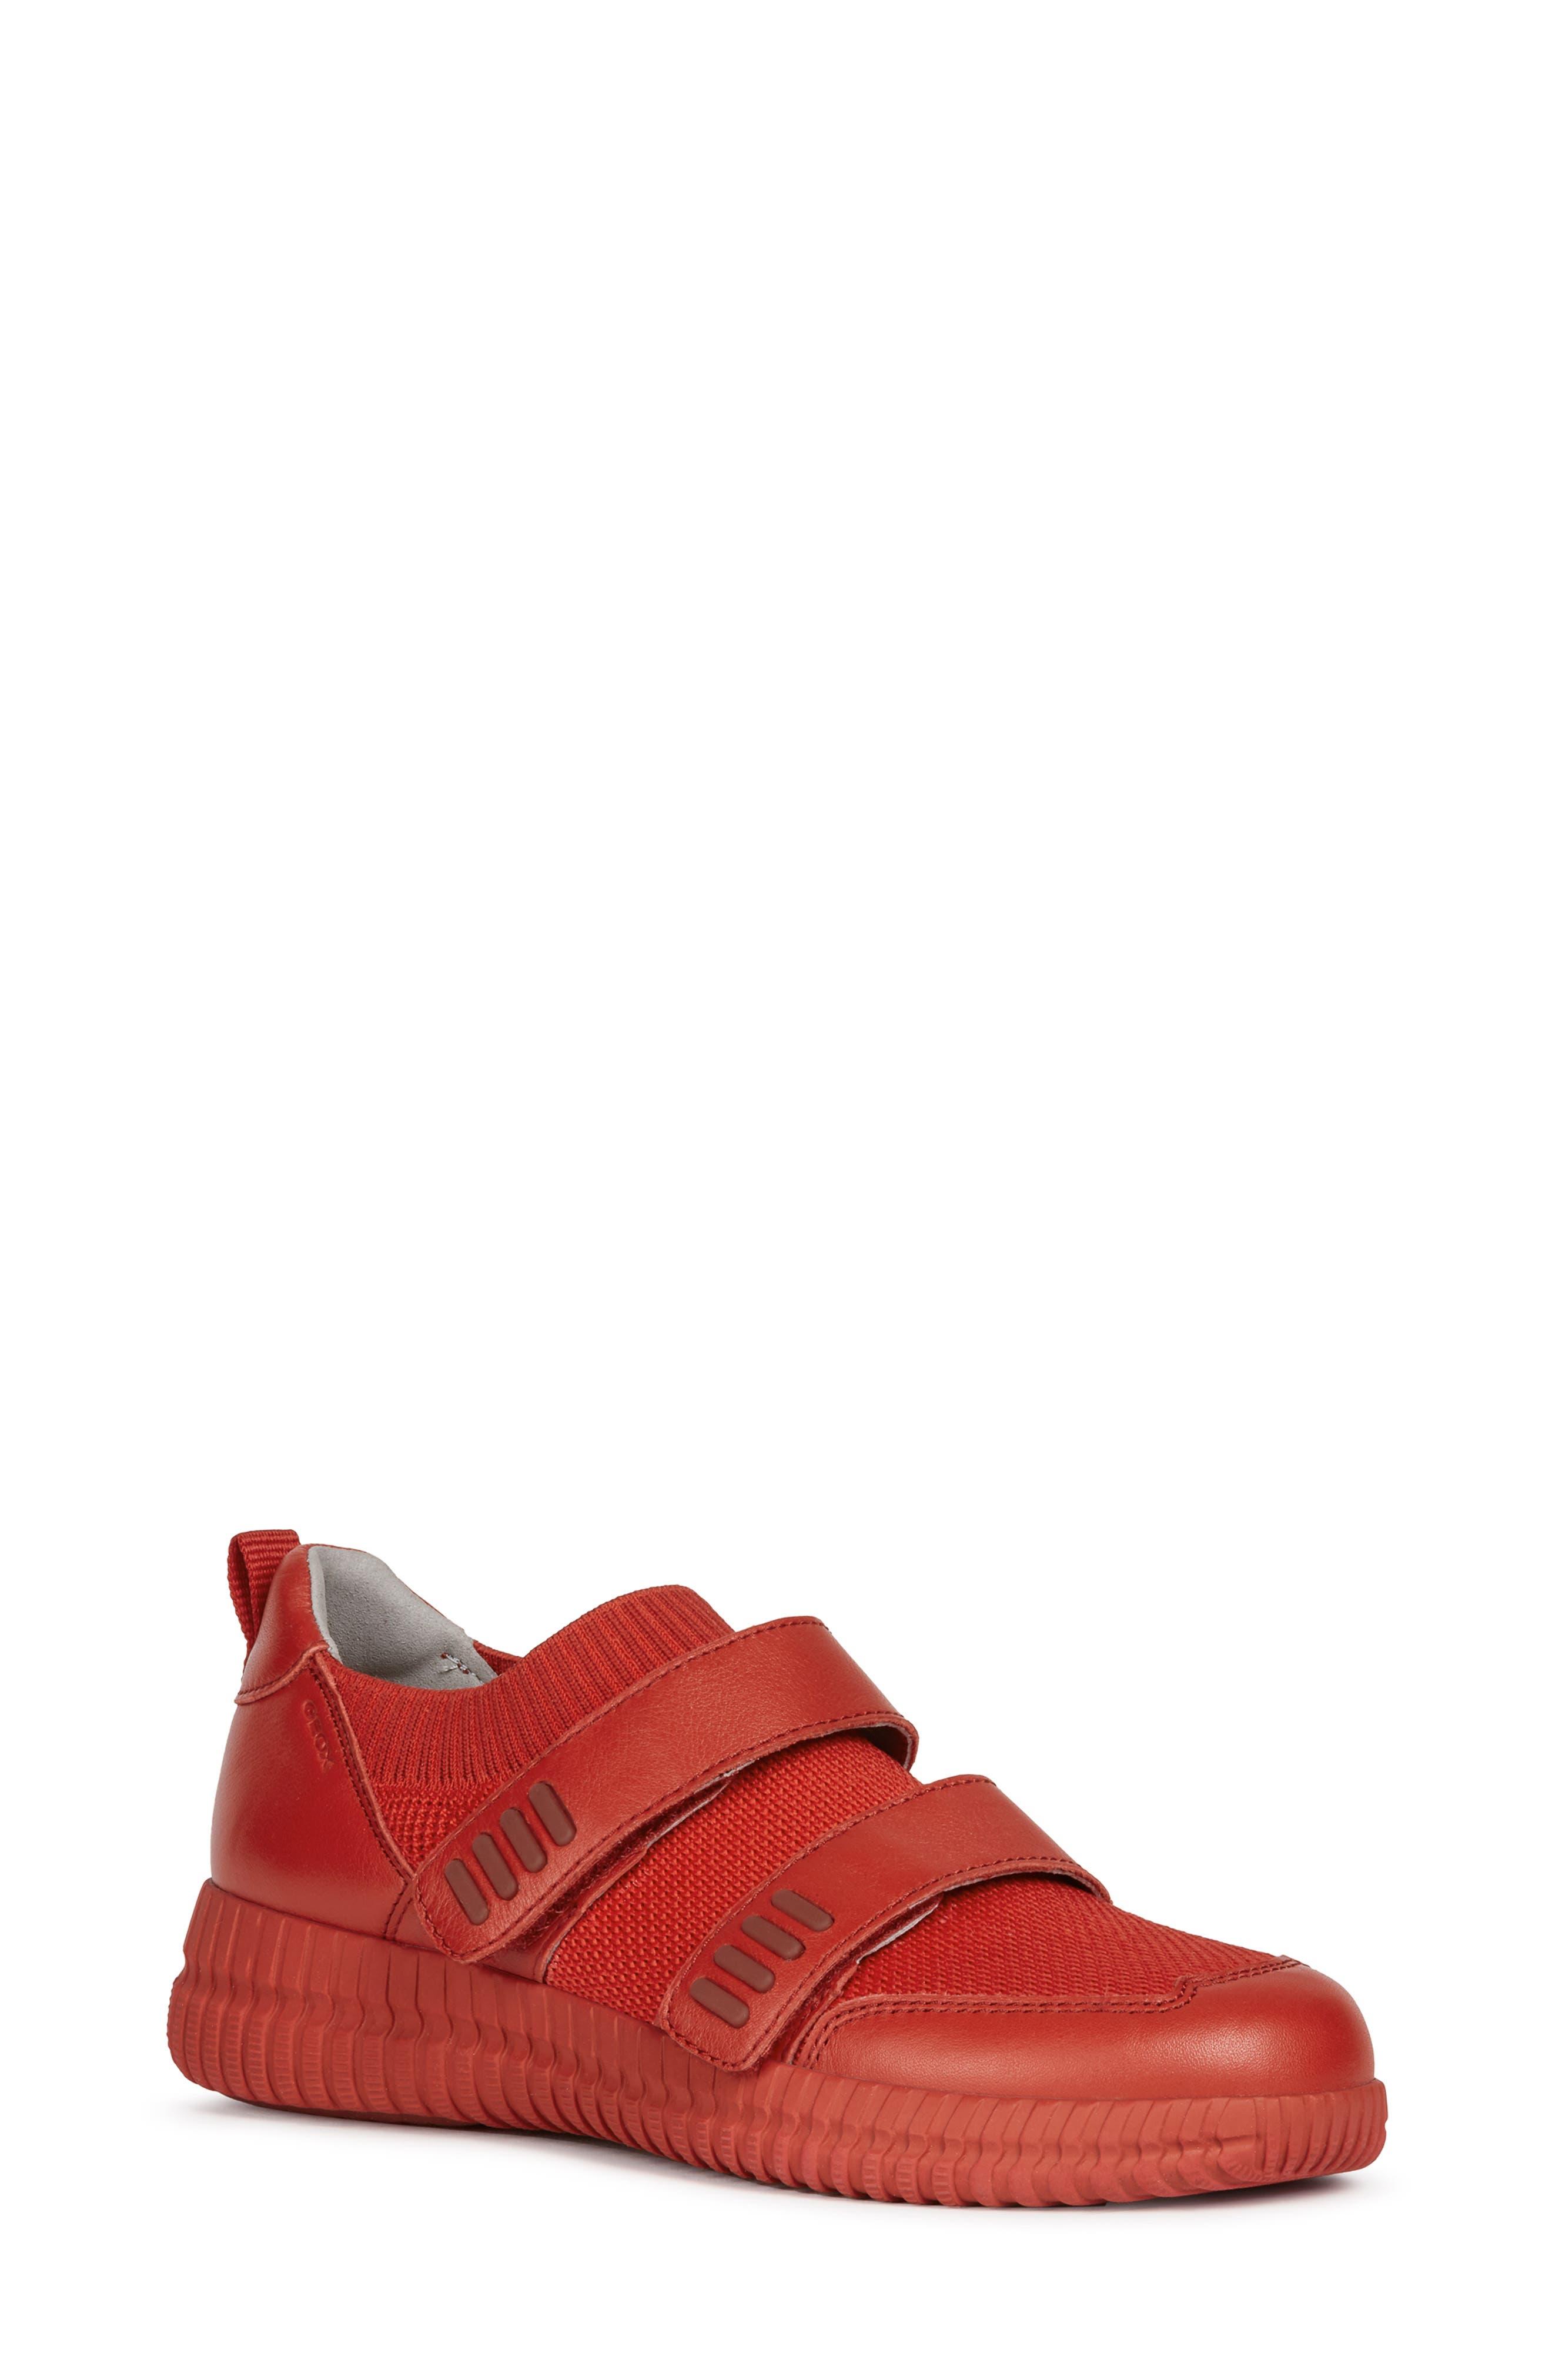 Women's Geox Shoes Sale \u0026 Clearance